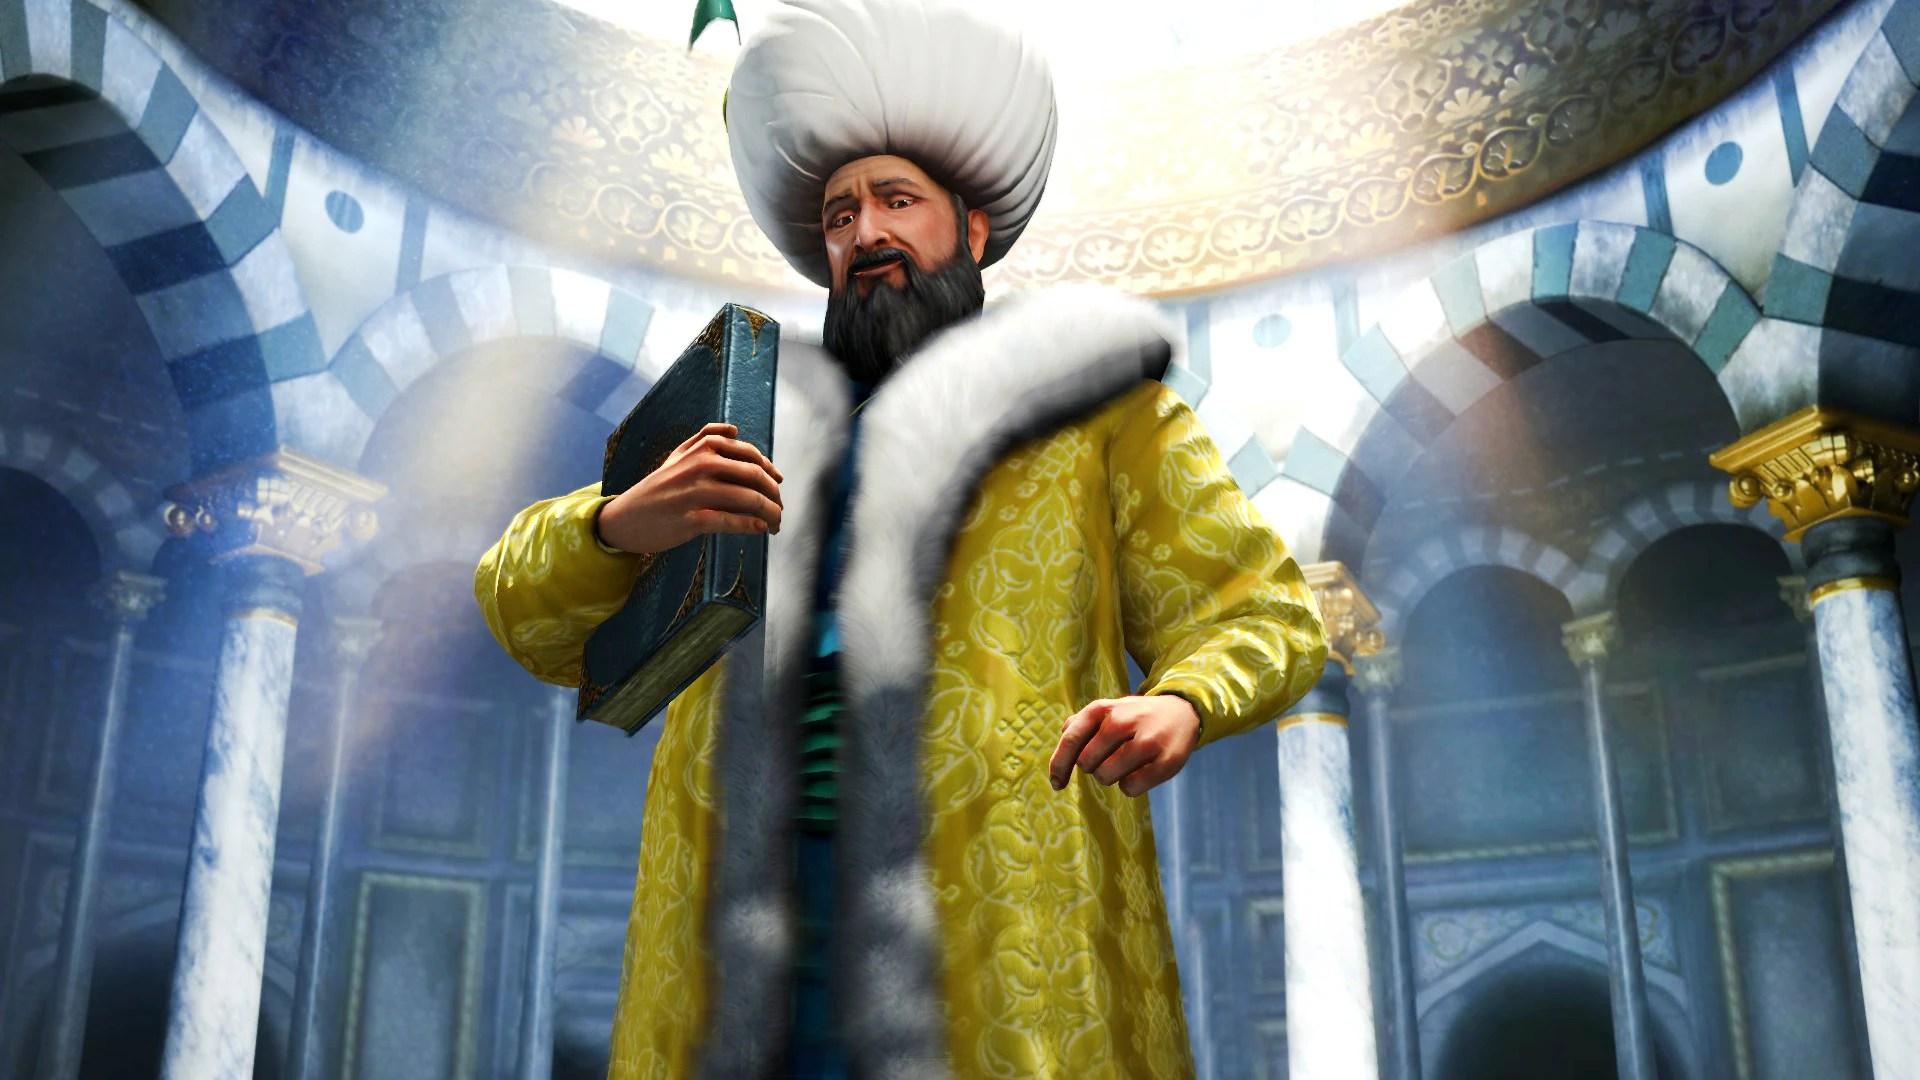 King Of The Fall Wallpaper Suleiman Civ5 Civilization Wiki Fandom Powered By Wikia